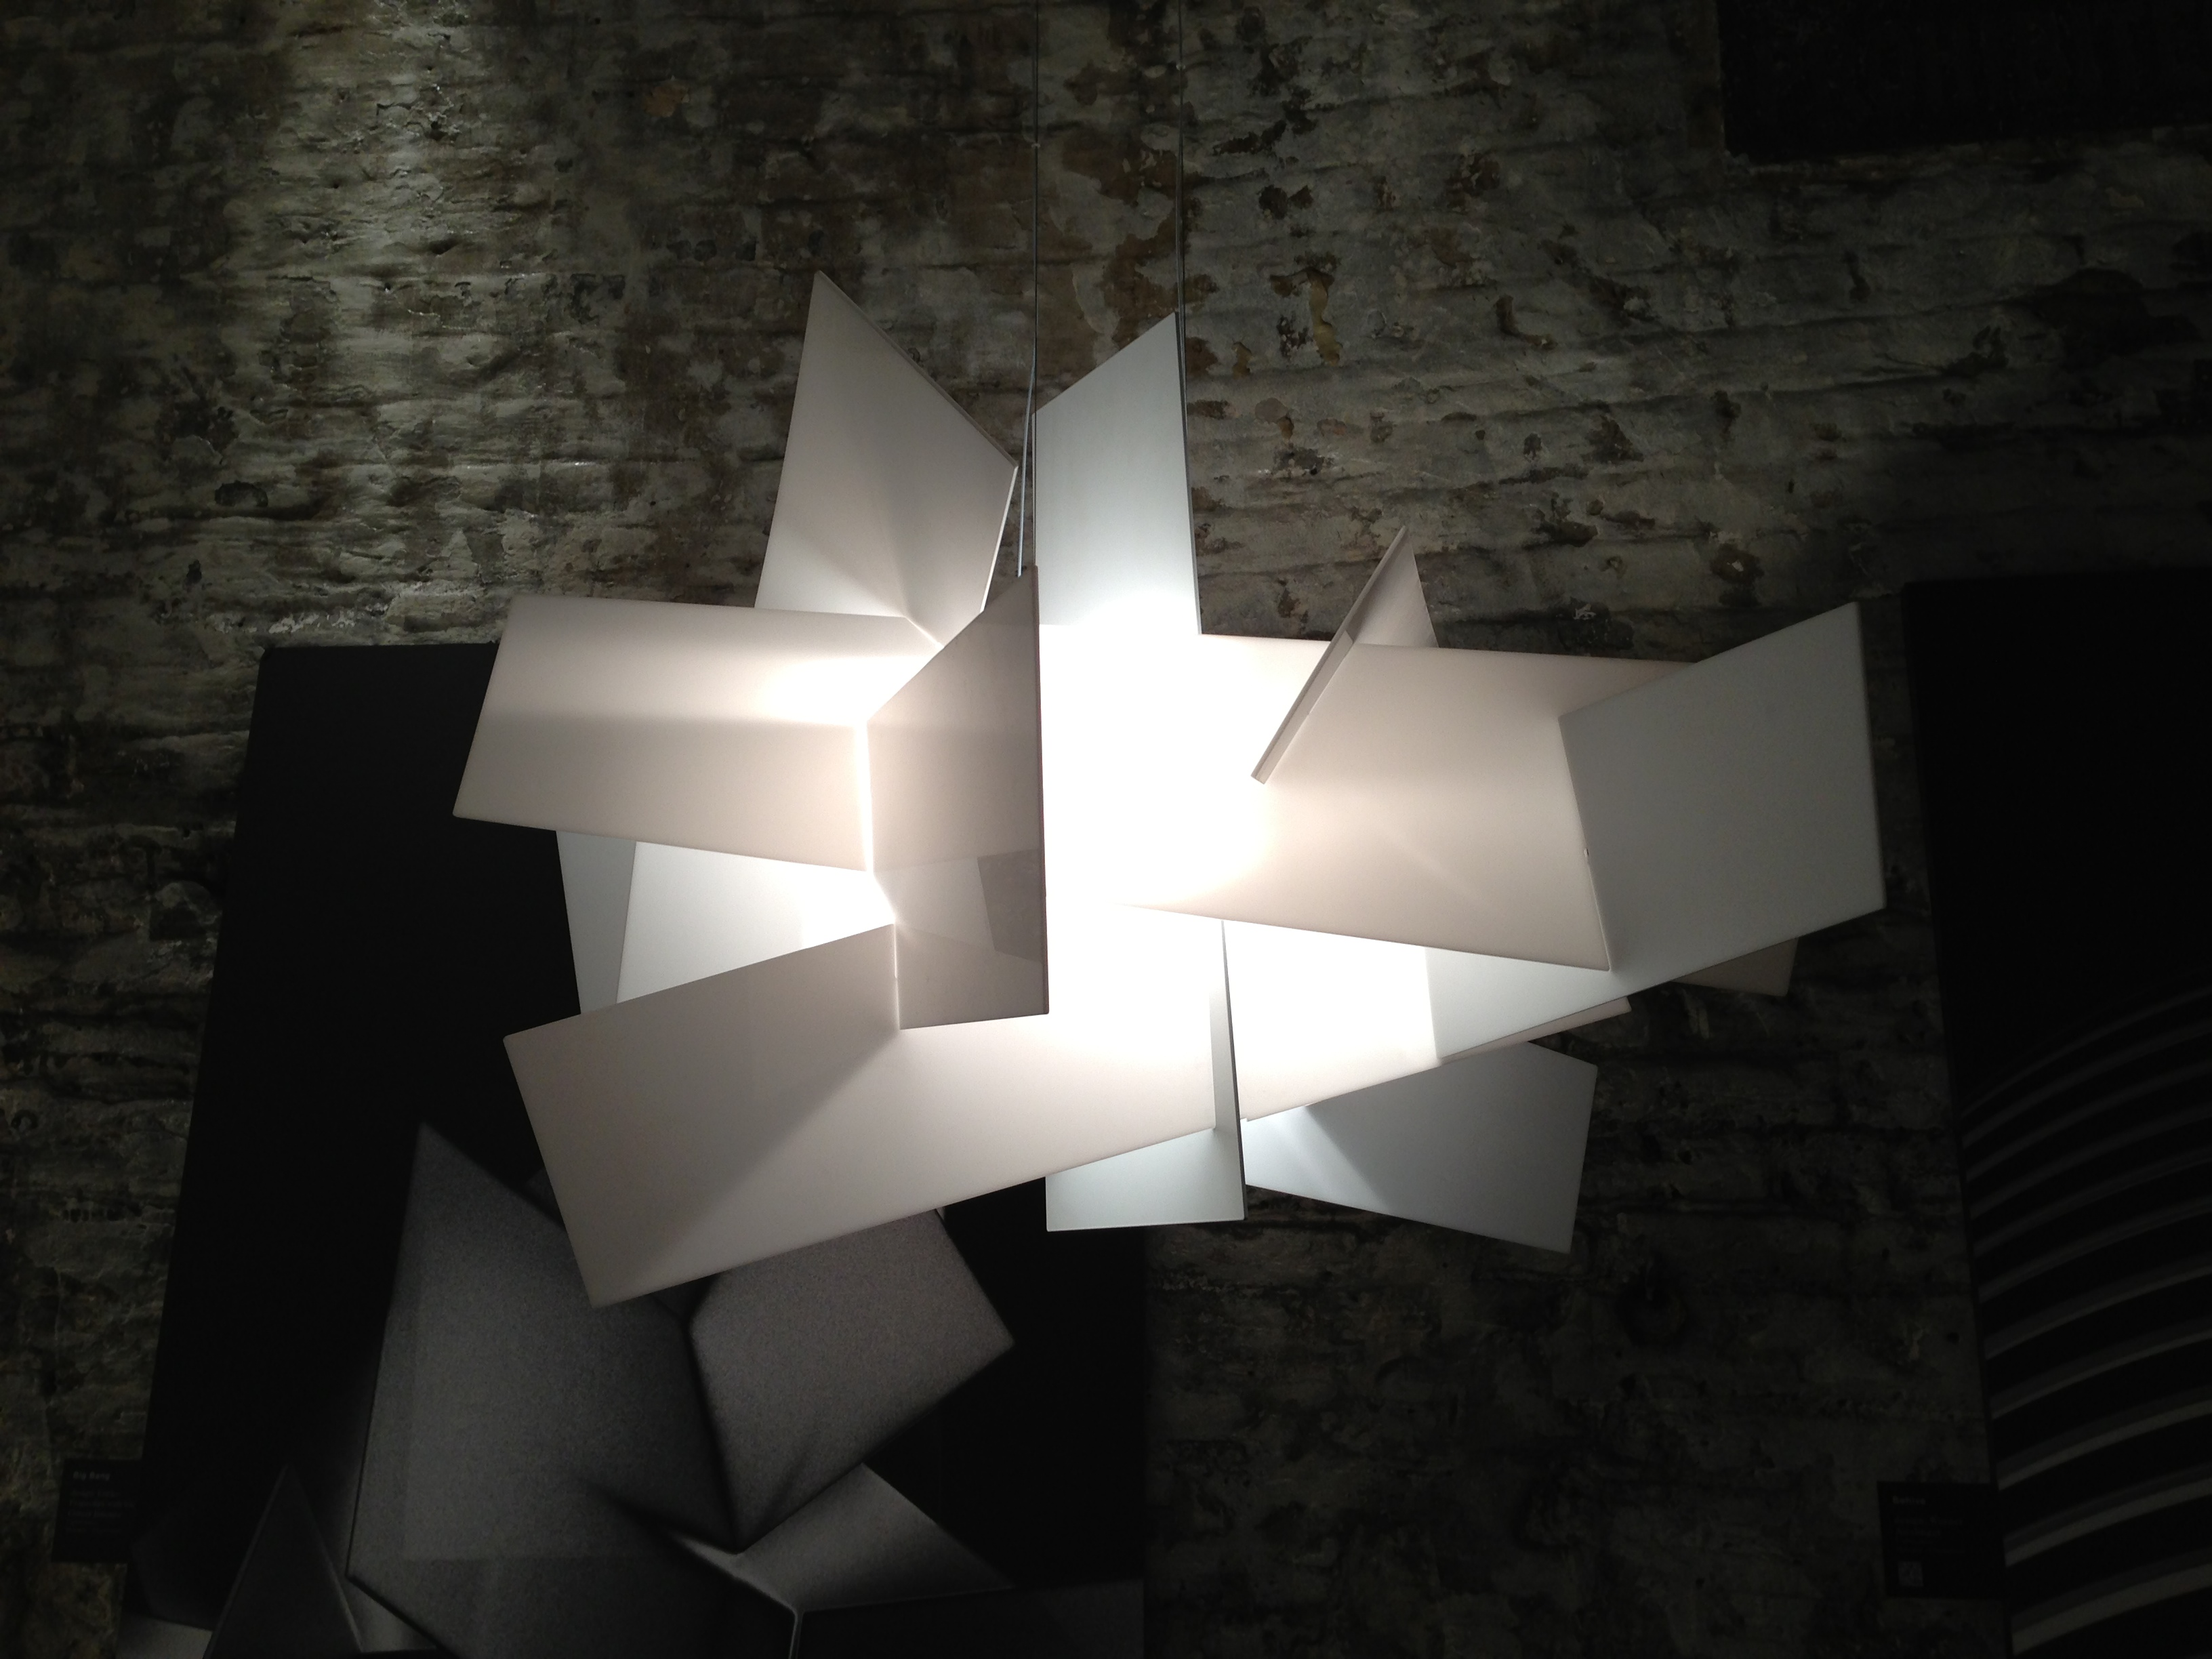 Plafoniere Foscarini : Foscarini big bang xl lampada a sospensione r7s 1510072 63